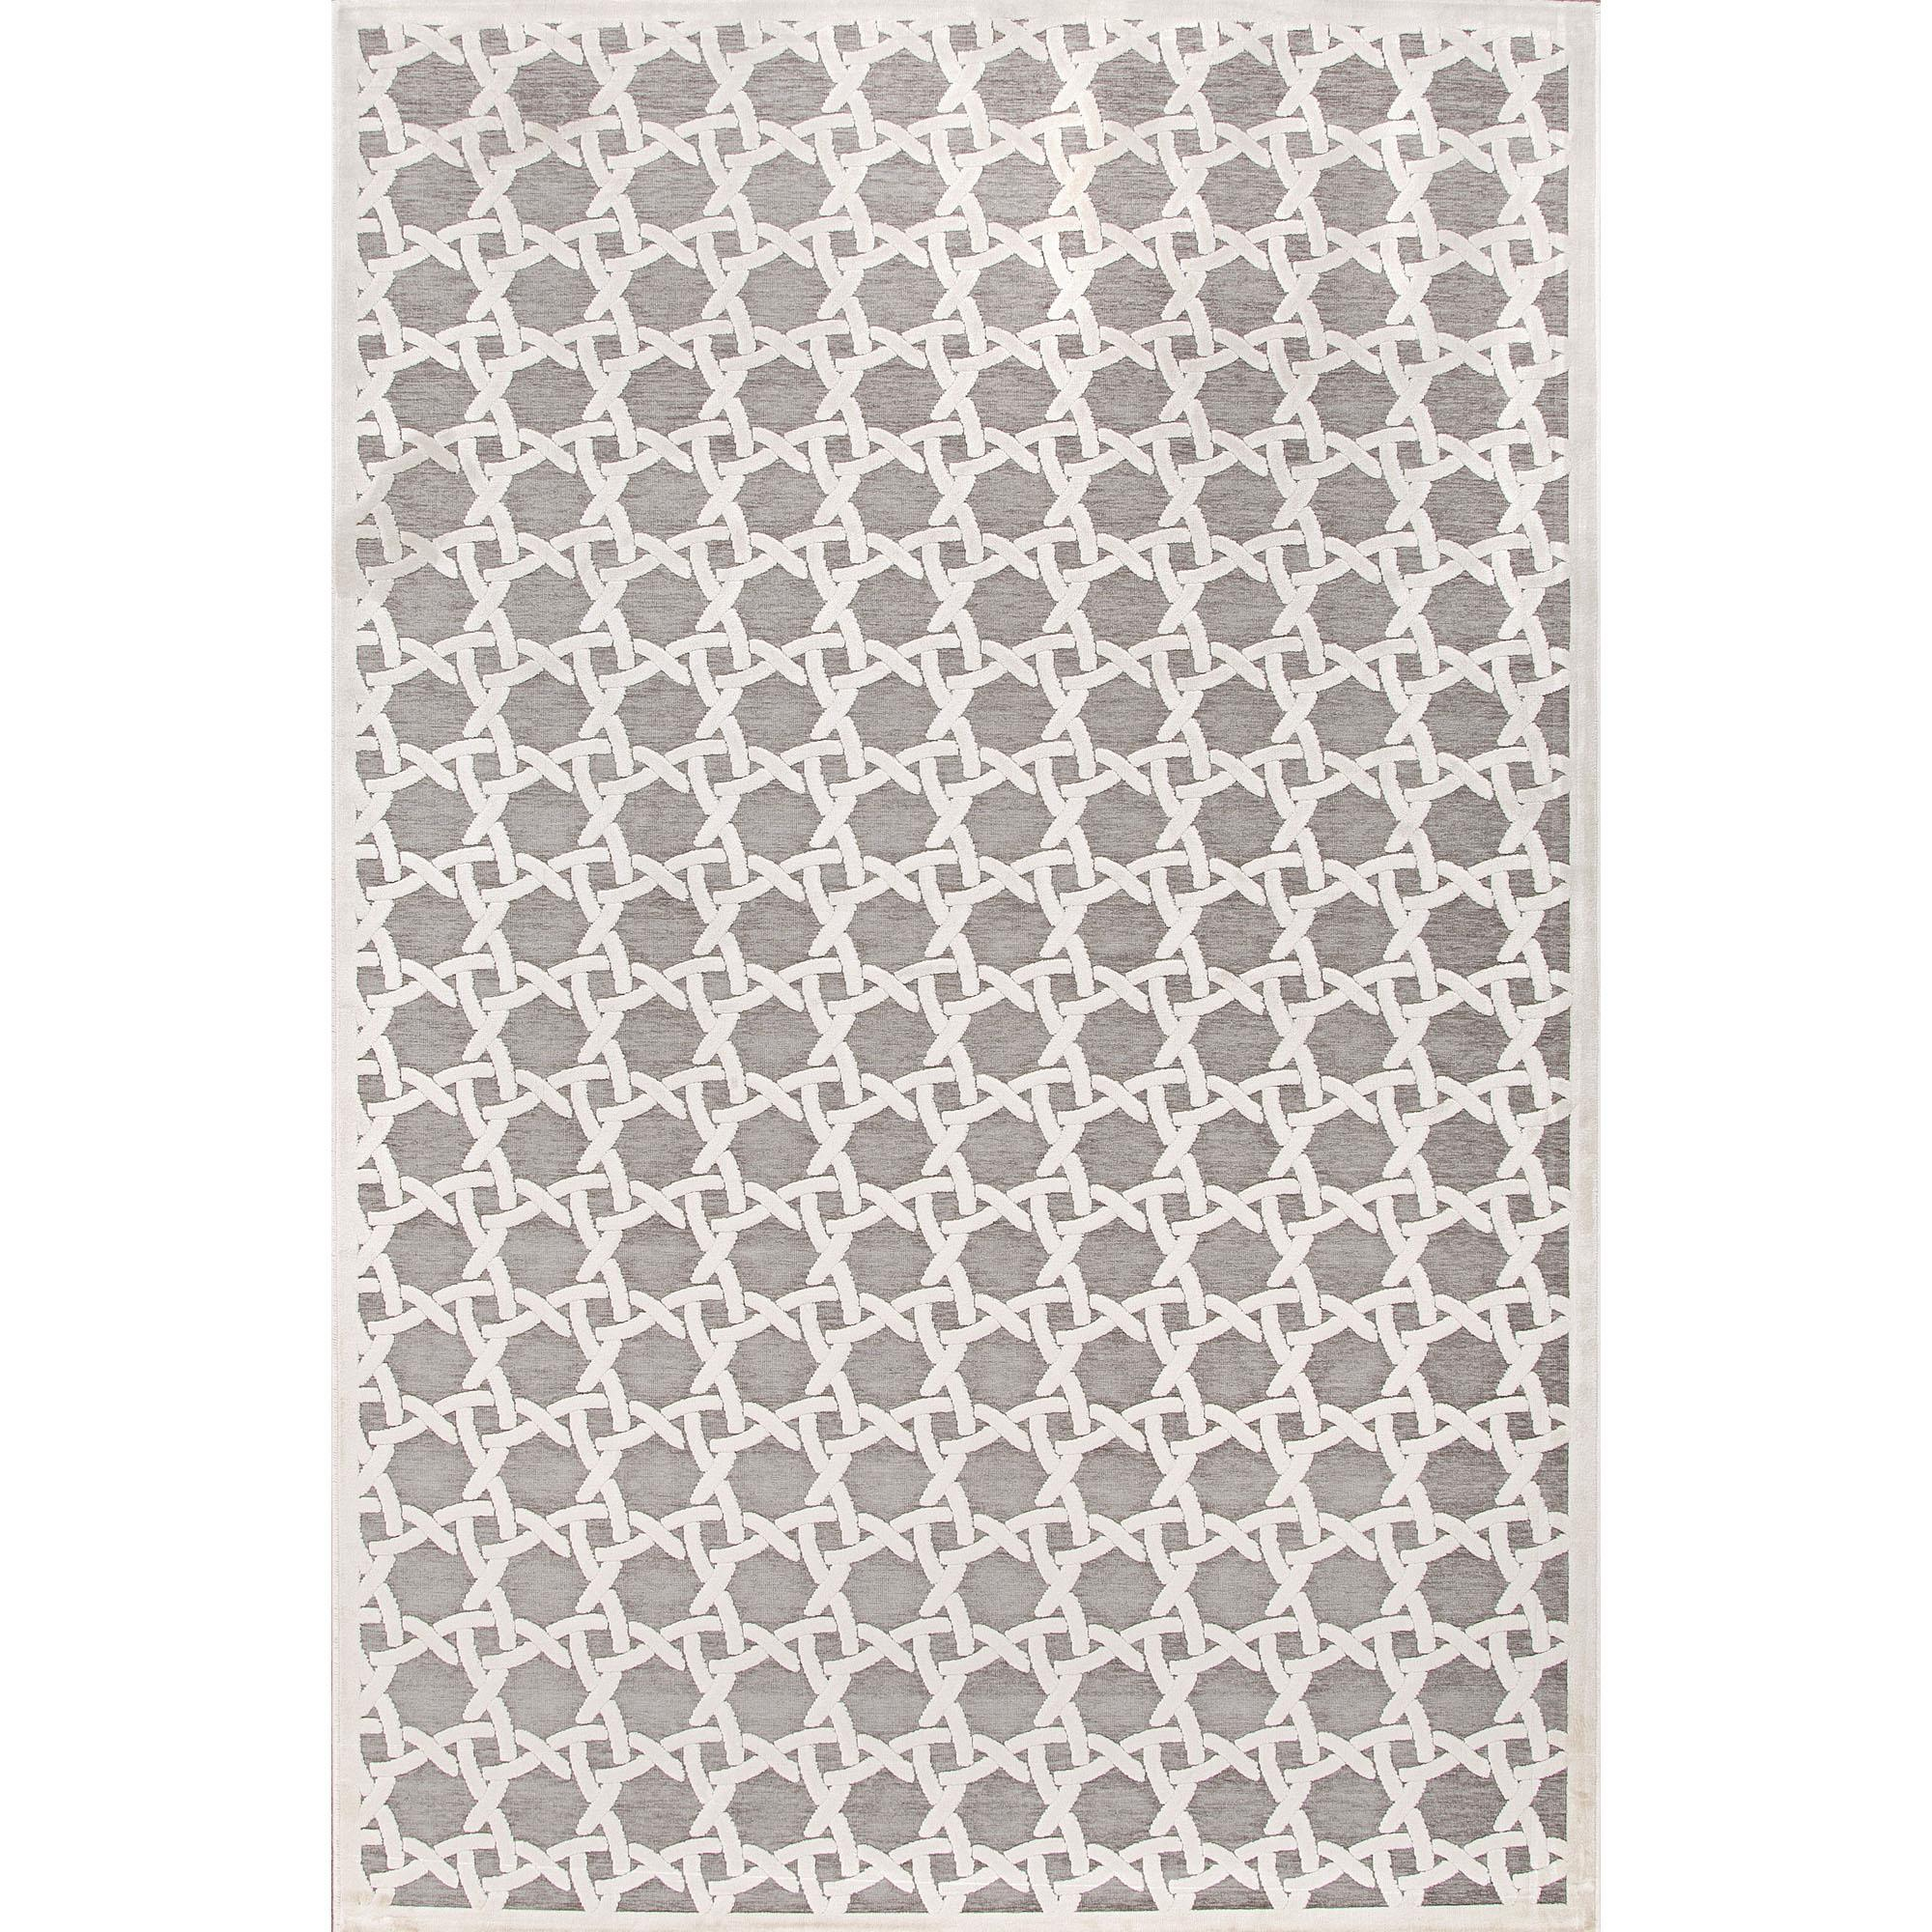 JAIPUR Rugs Fables 2 x 3 Rug - Item Number: RUG111964